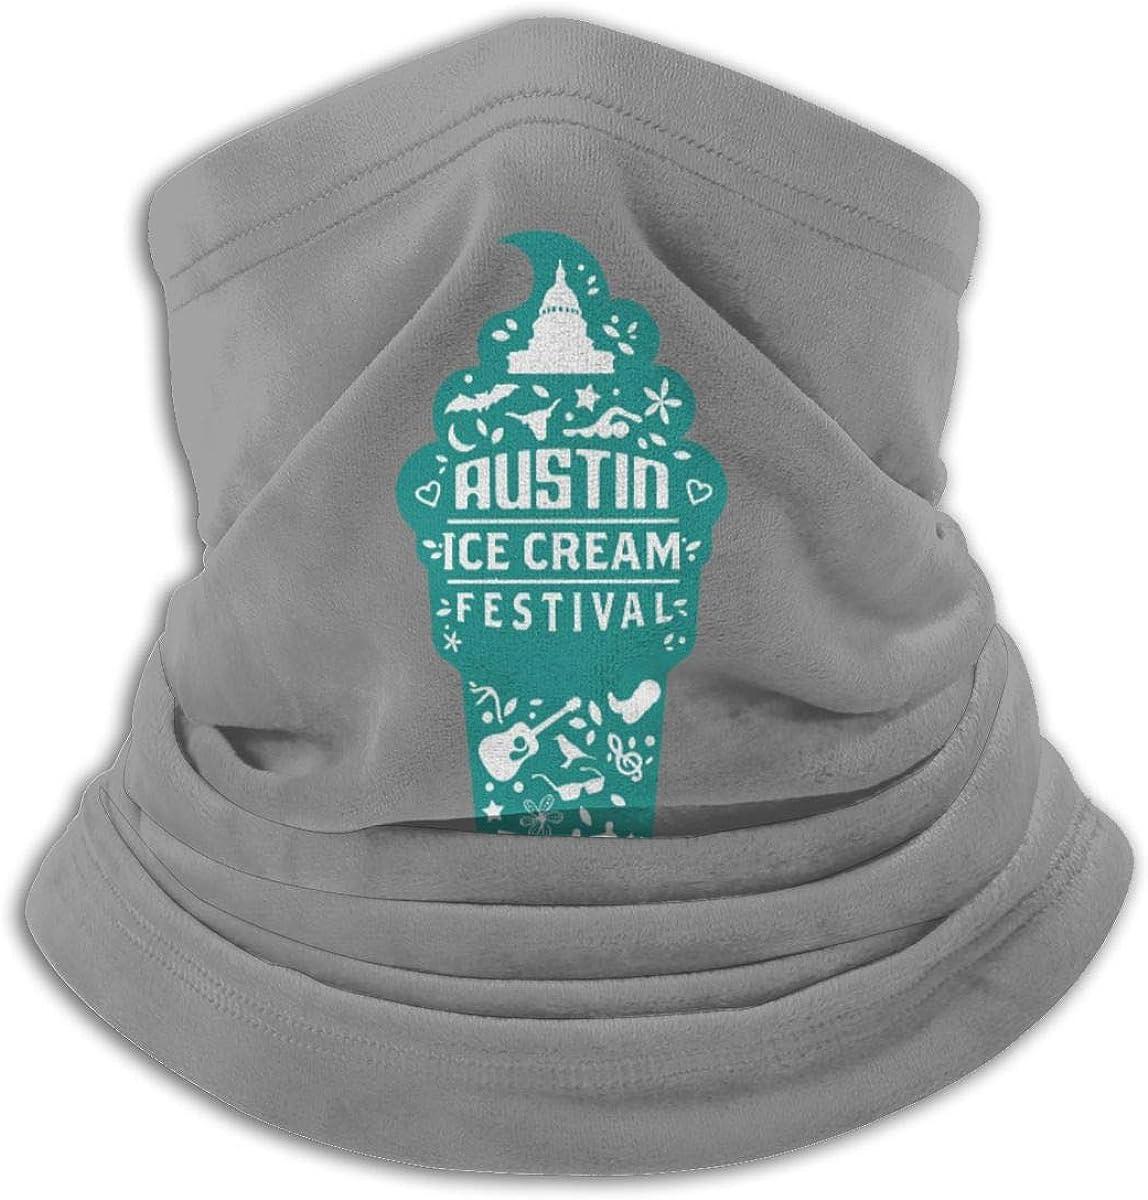 Austin Ice Cream Festival Black Multi-function Neck Warmer Gaiter Polyester Neck Warmer Windproof Winter Neck Gaiter Cold Weather Scarf For Men Women